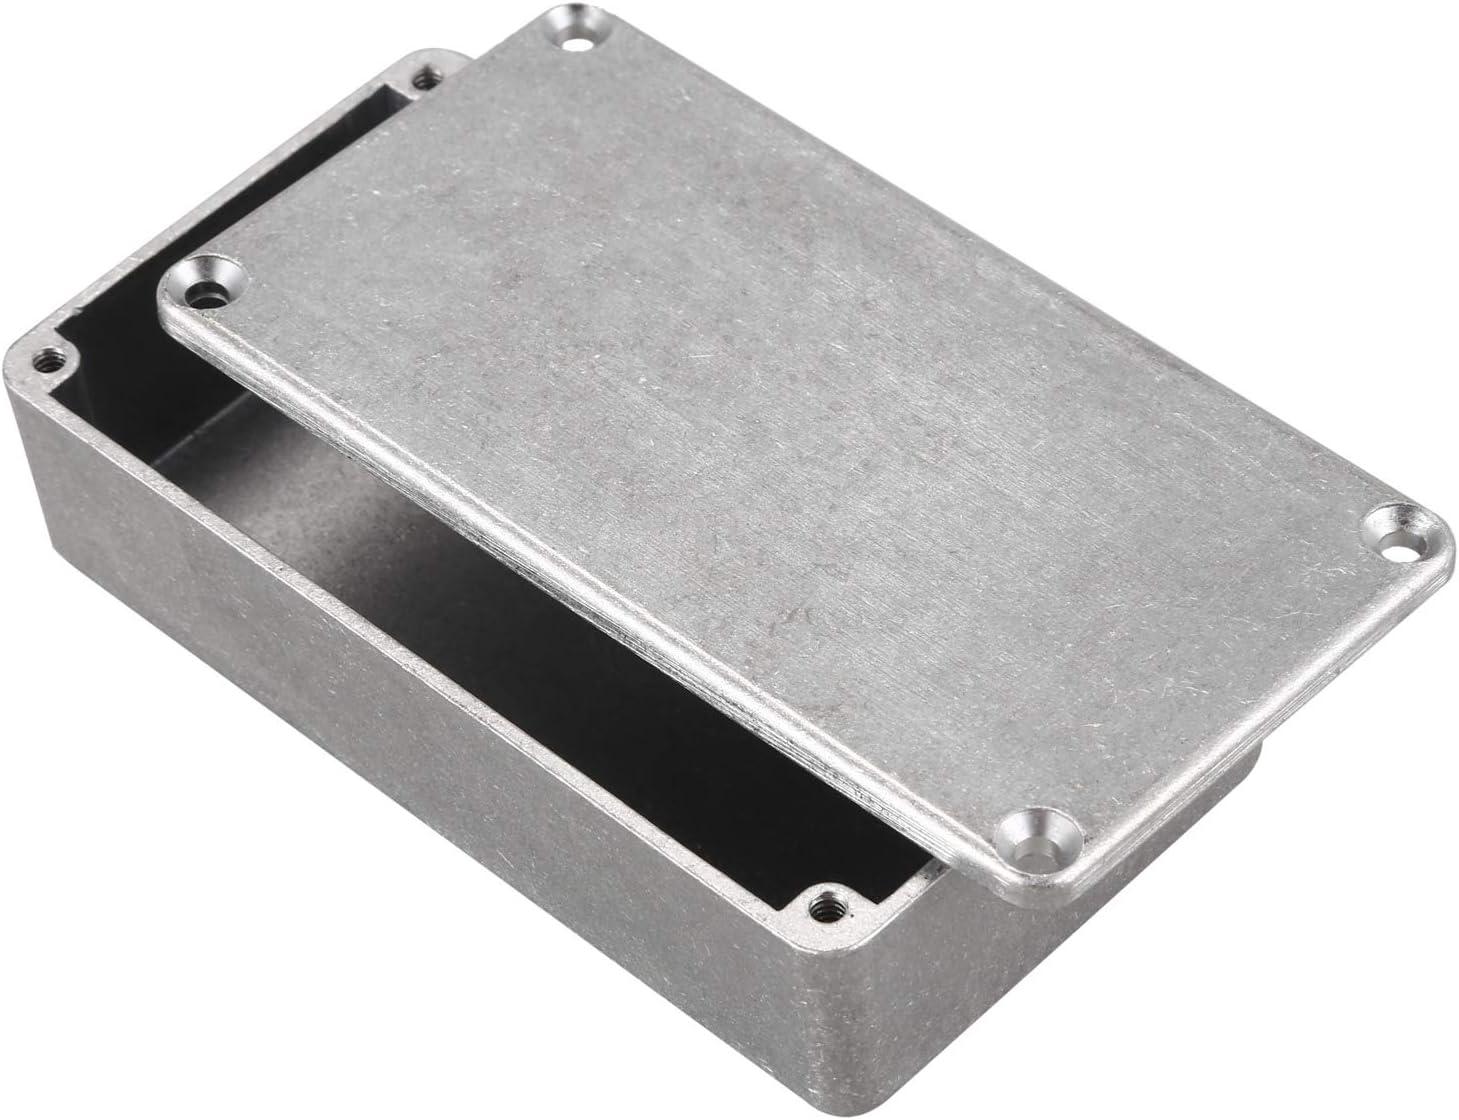 TOOGOO 5 Pcs Guitar Effects Pedal Aluminum Stomp Box Enclosure for DIY Guitar Pedal Kit 1590B